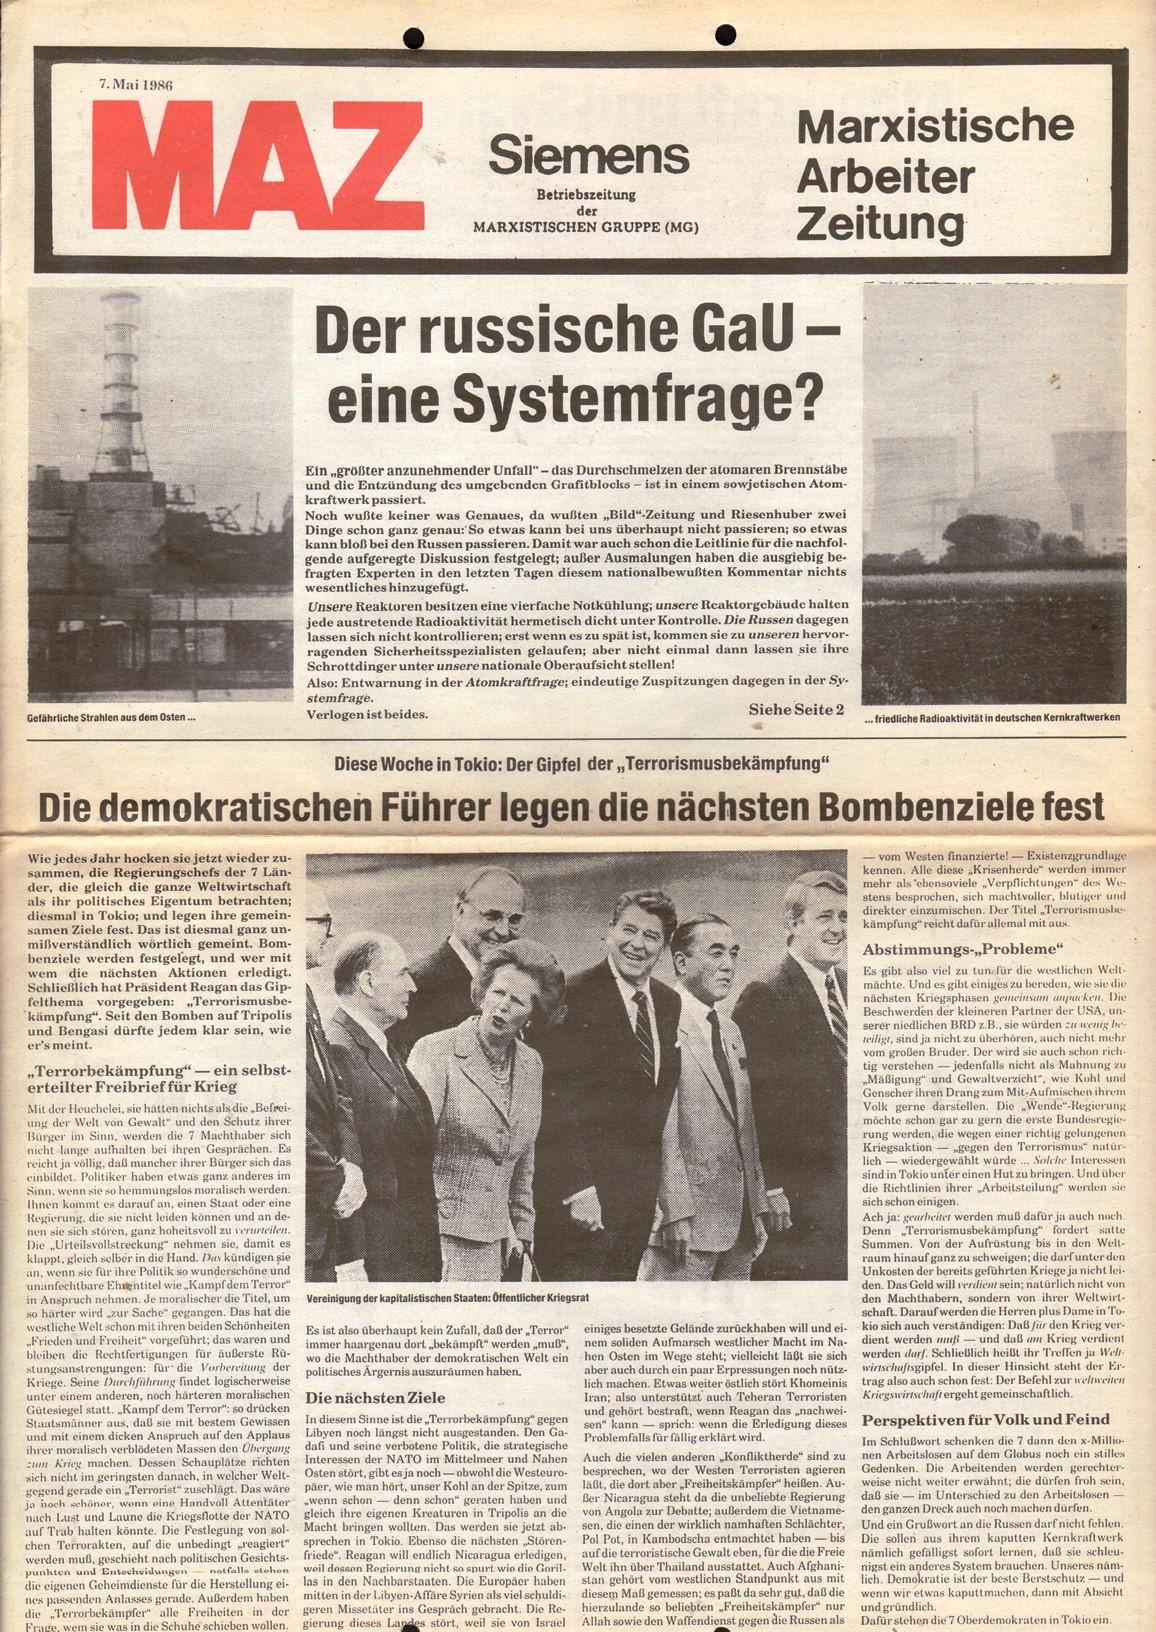 Muenchen_MG_MAZ_Siemens_19860507_01